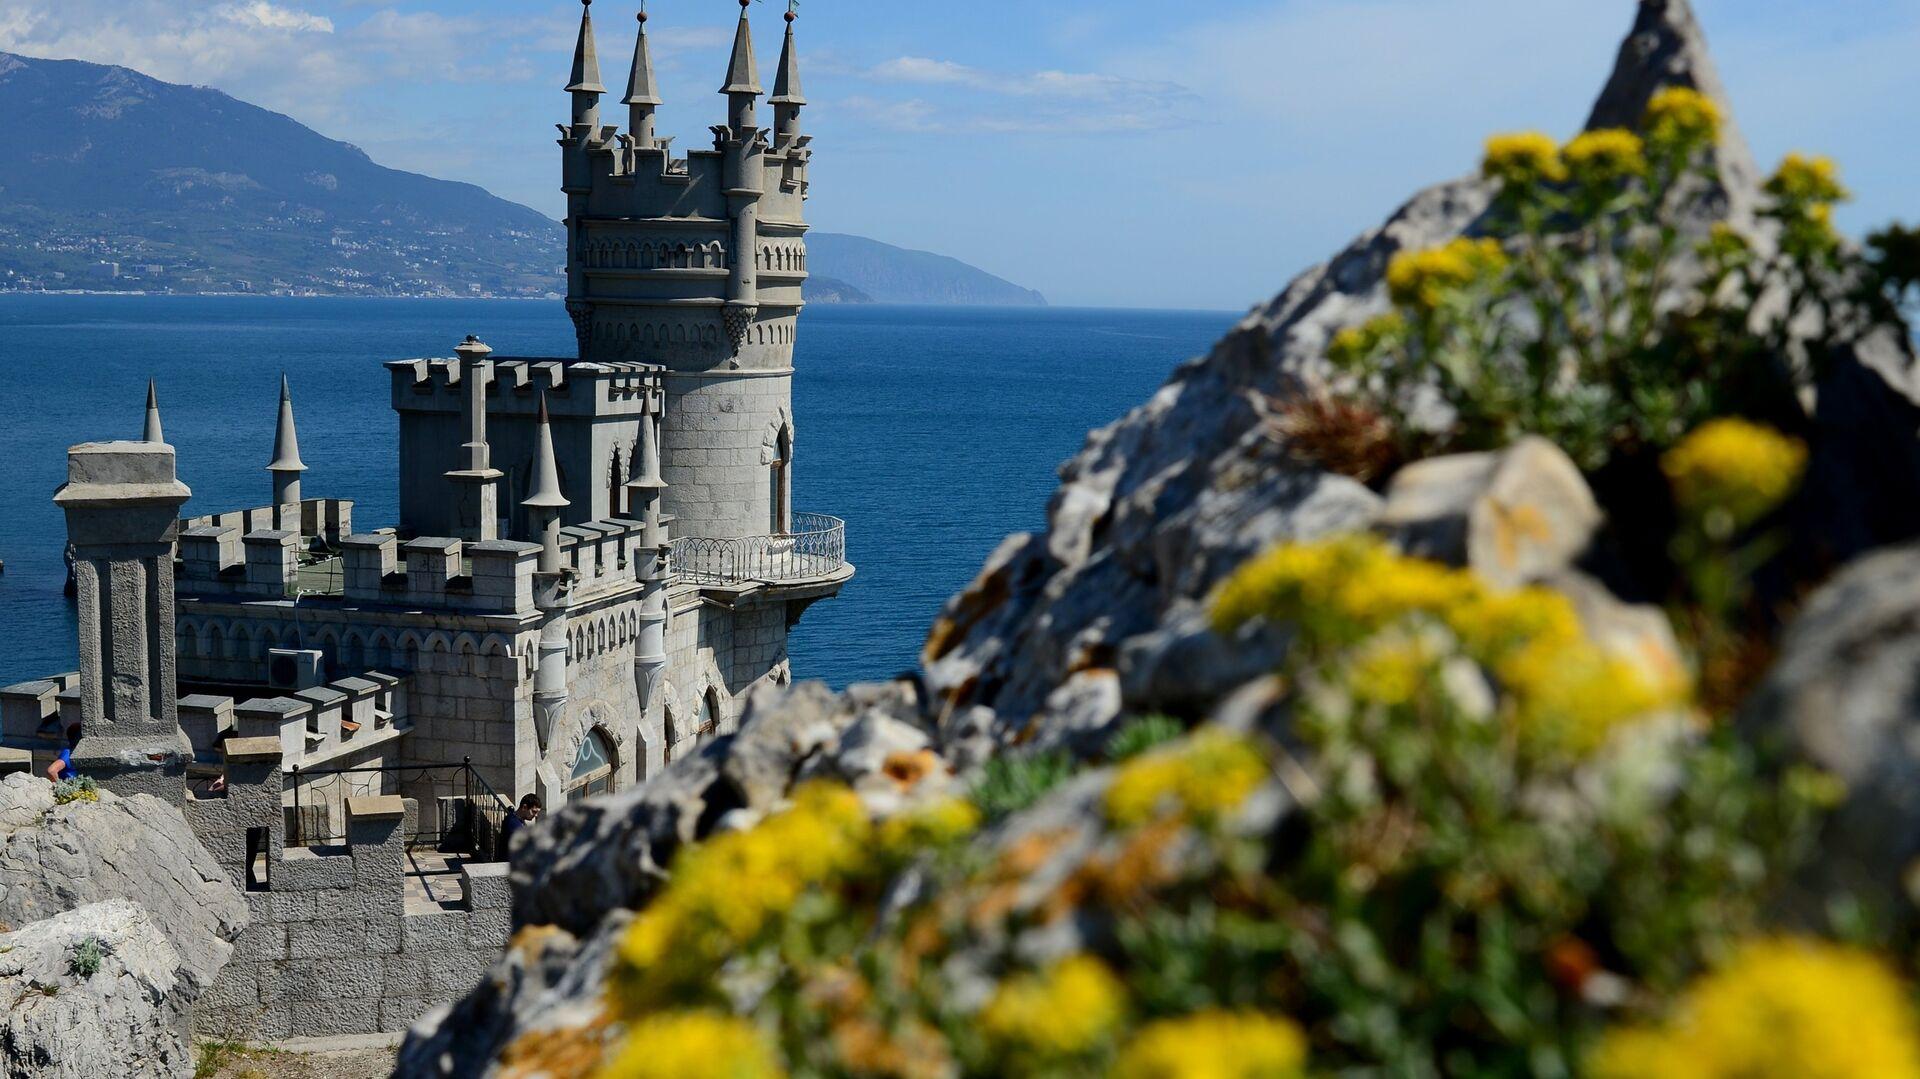 Castillo Nido de Golondrina en Yalta, Crimea - Sputnik Mundo, 1920, 16.09.2021